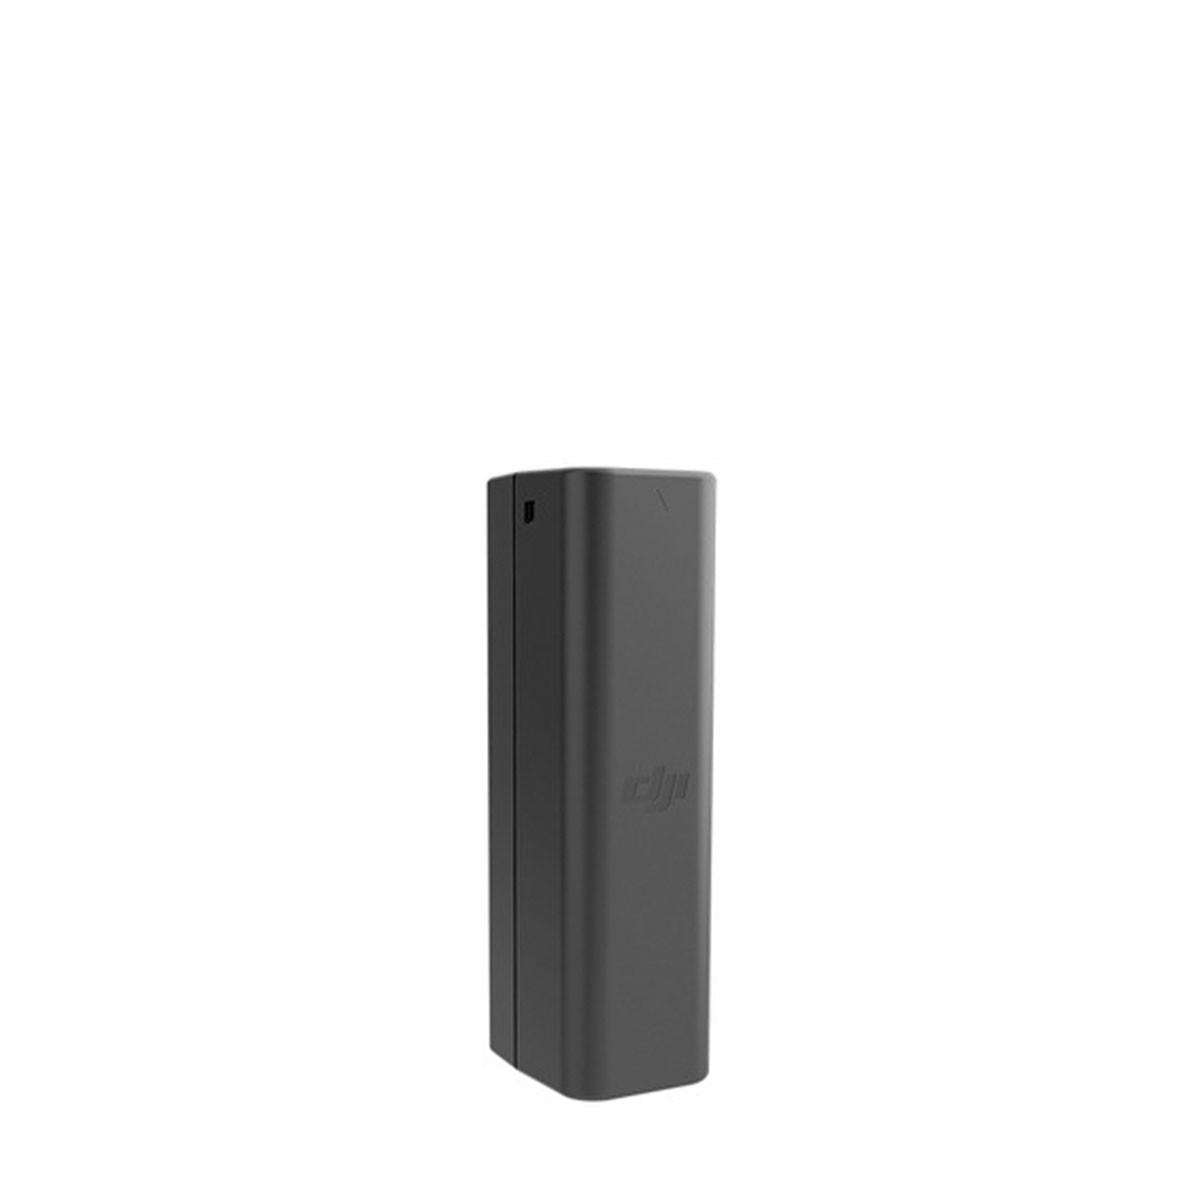 DJI - Osmo Mobile akkumulátor